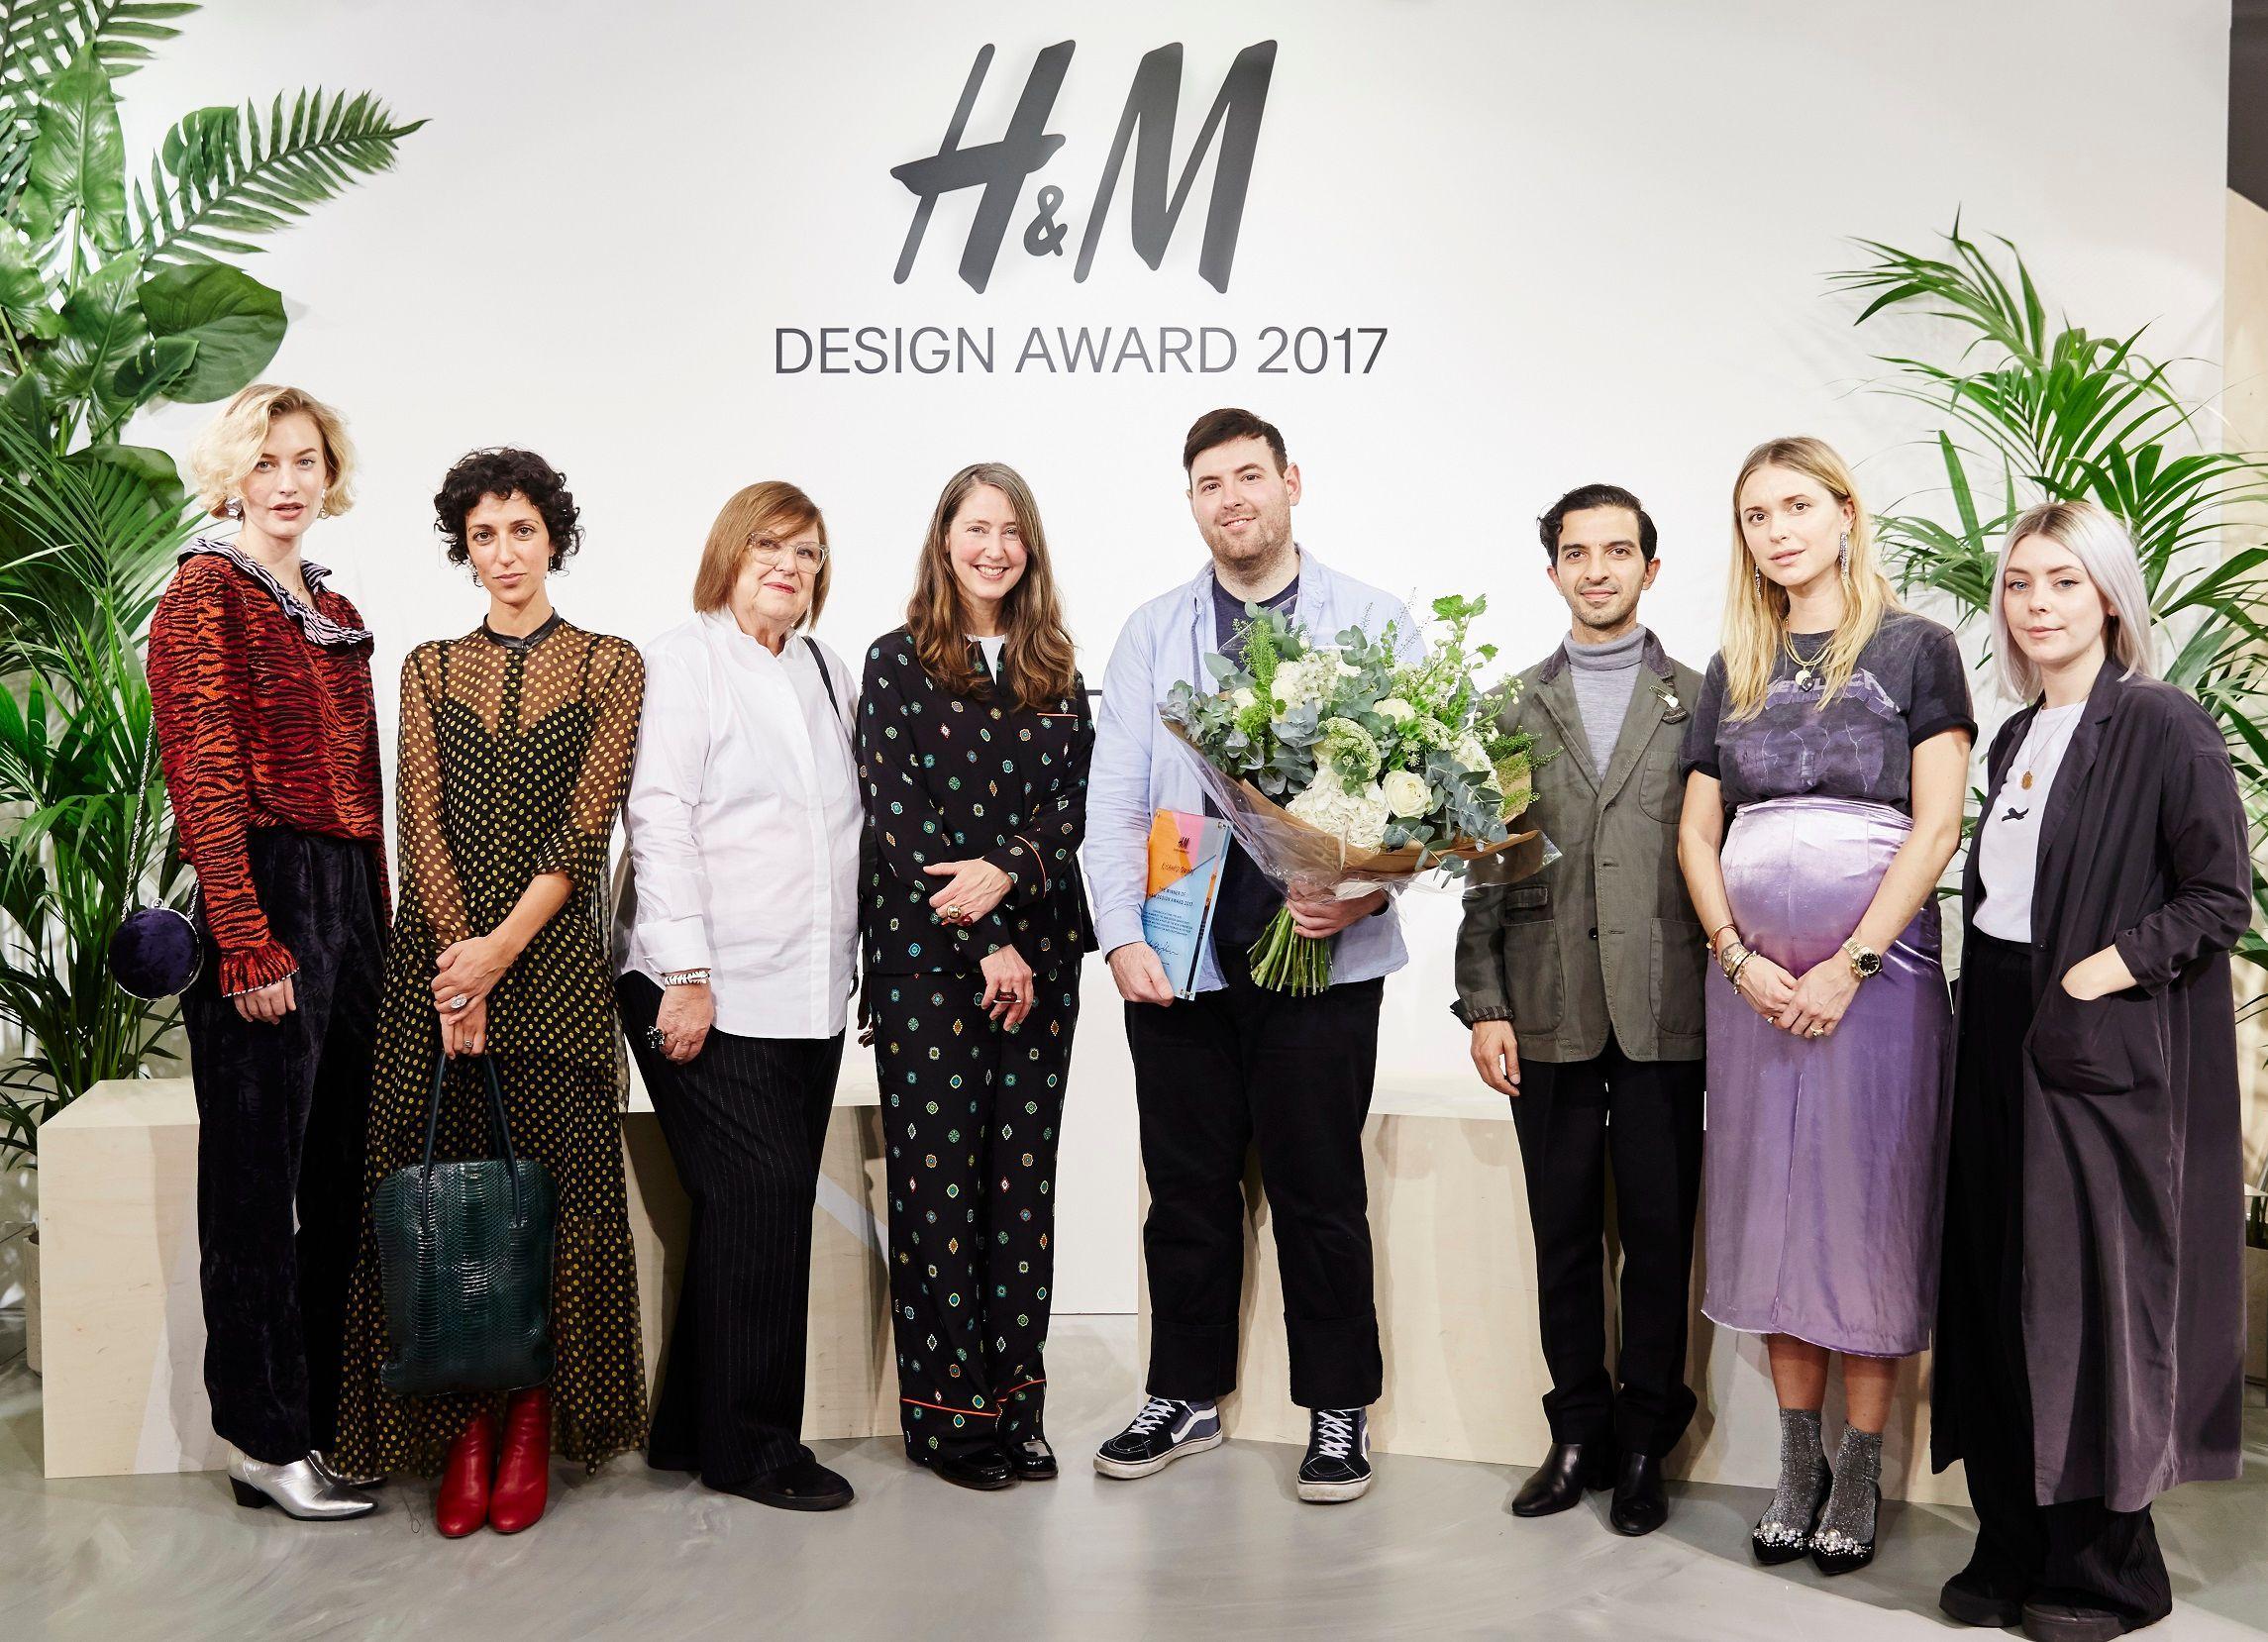 HMDA17-winner-jury-300dpi